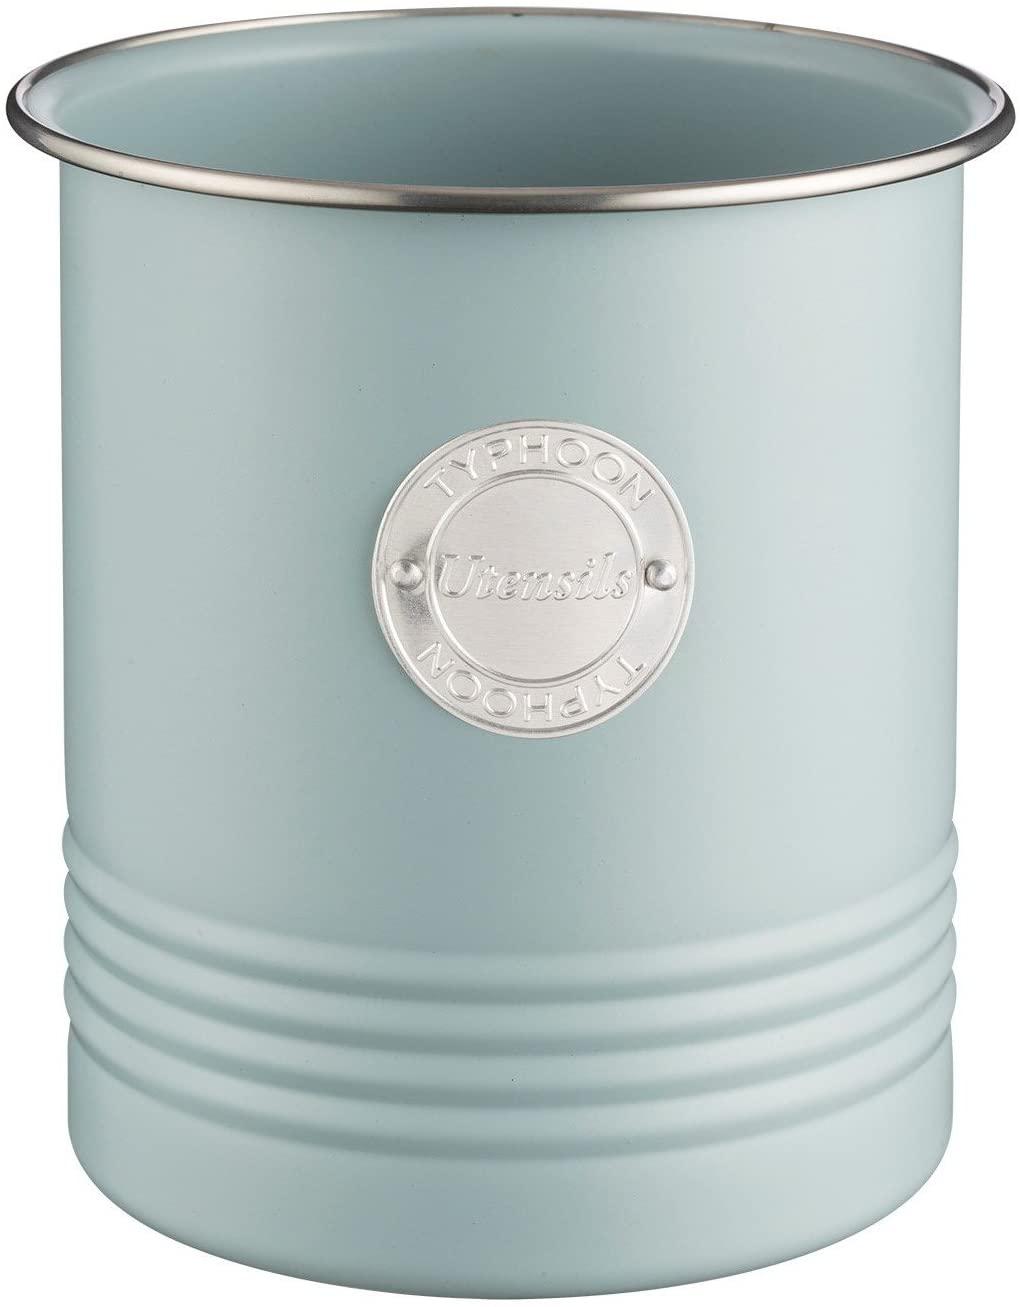 Typhoon Living Collection Utensilienbehälter, pastellblau, 1,7 Liter